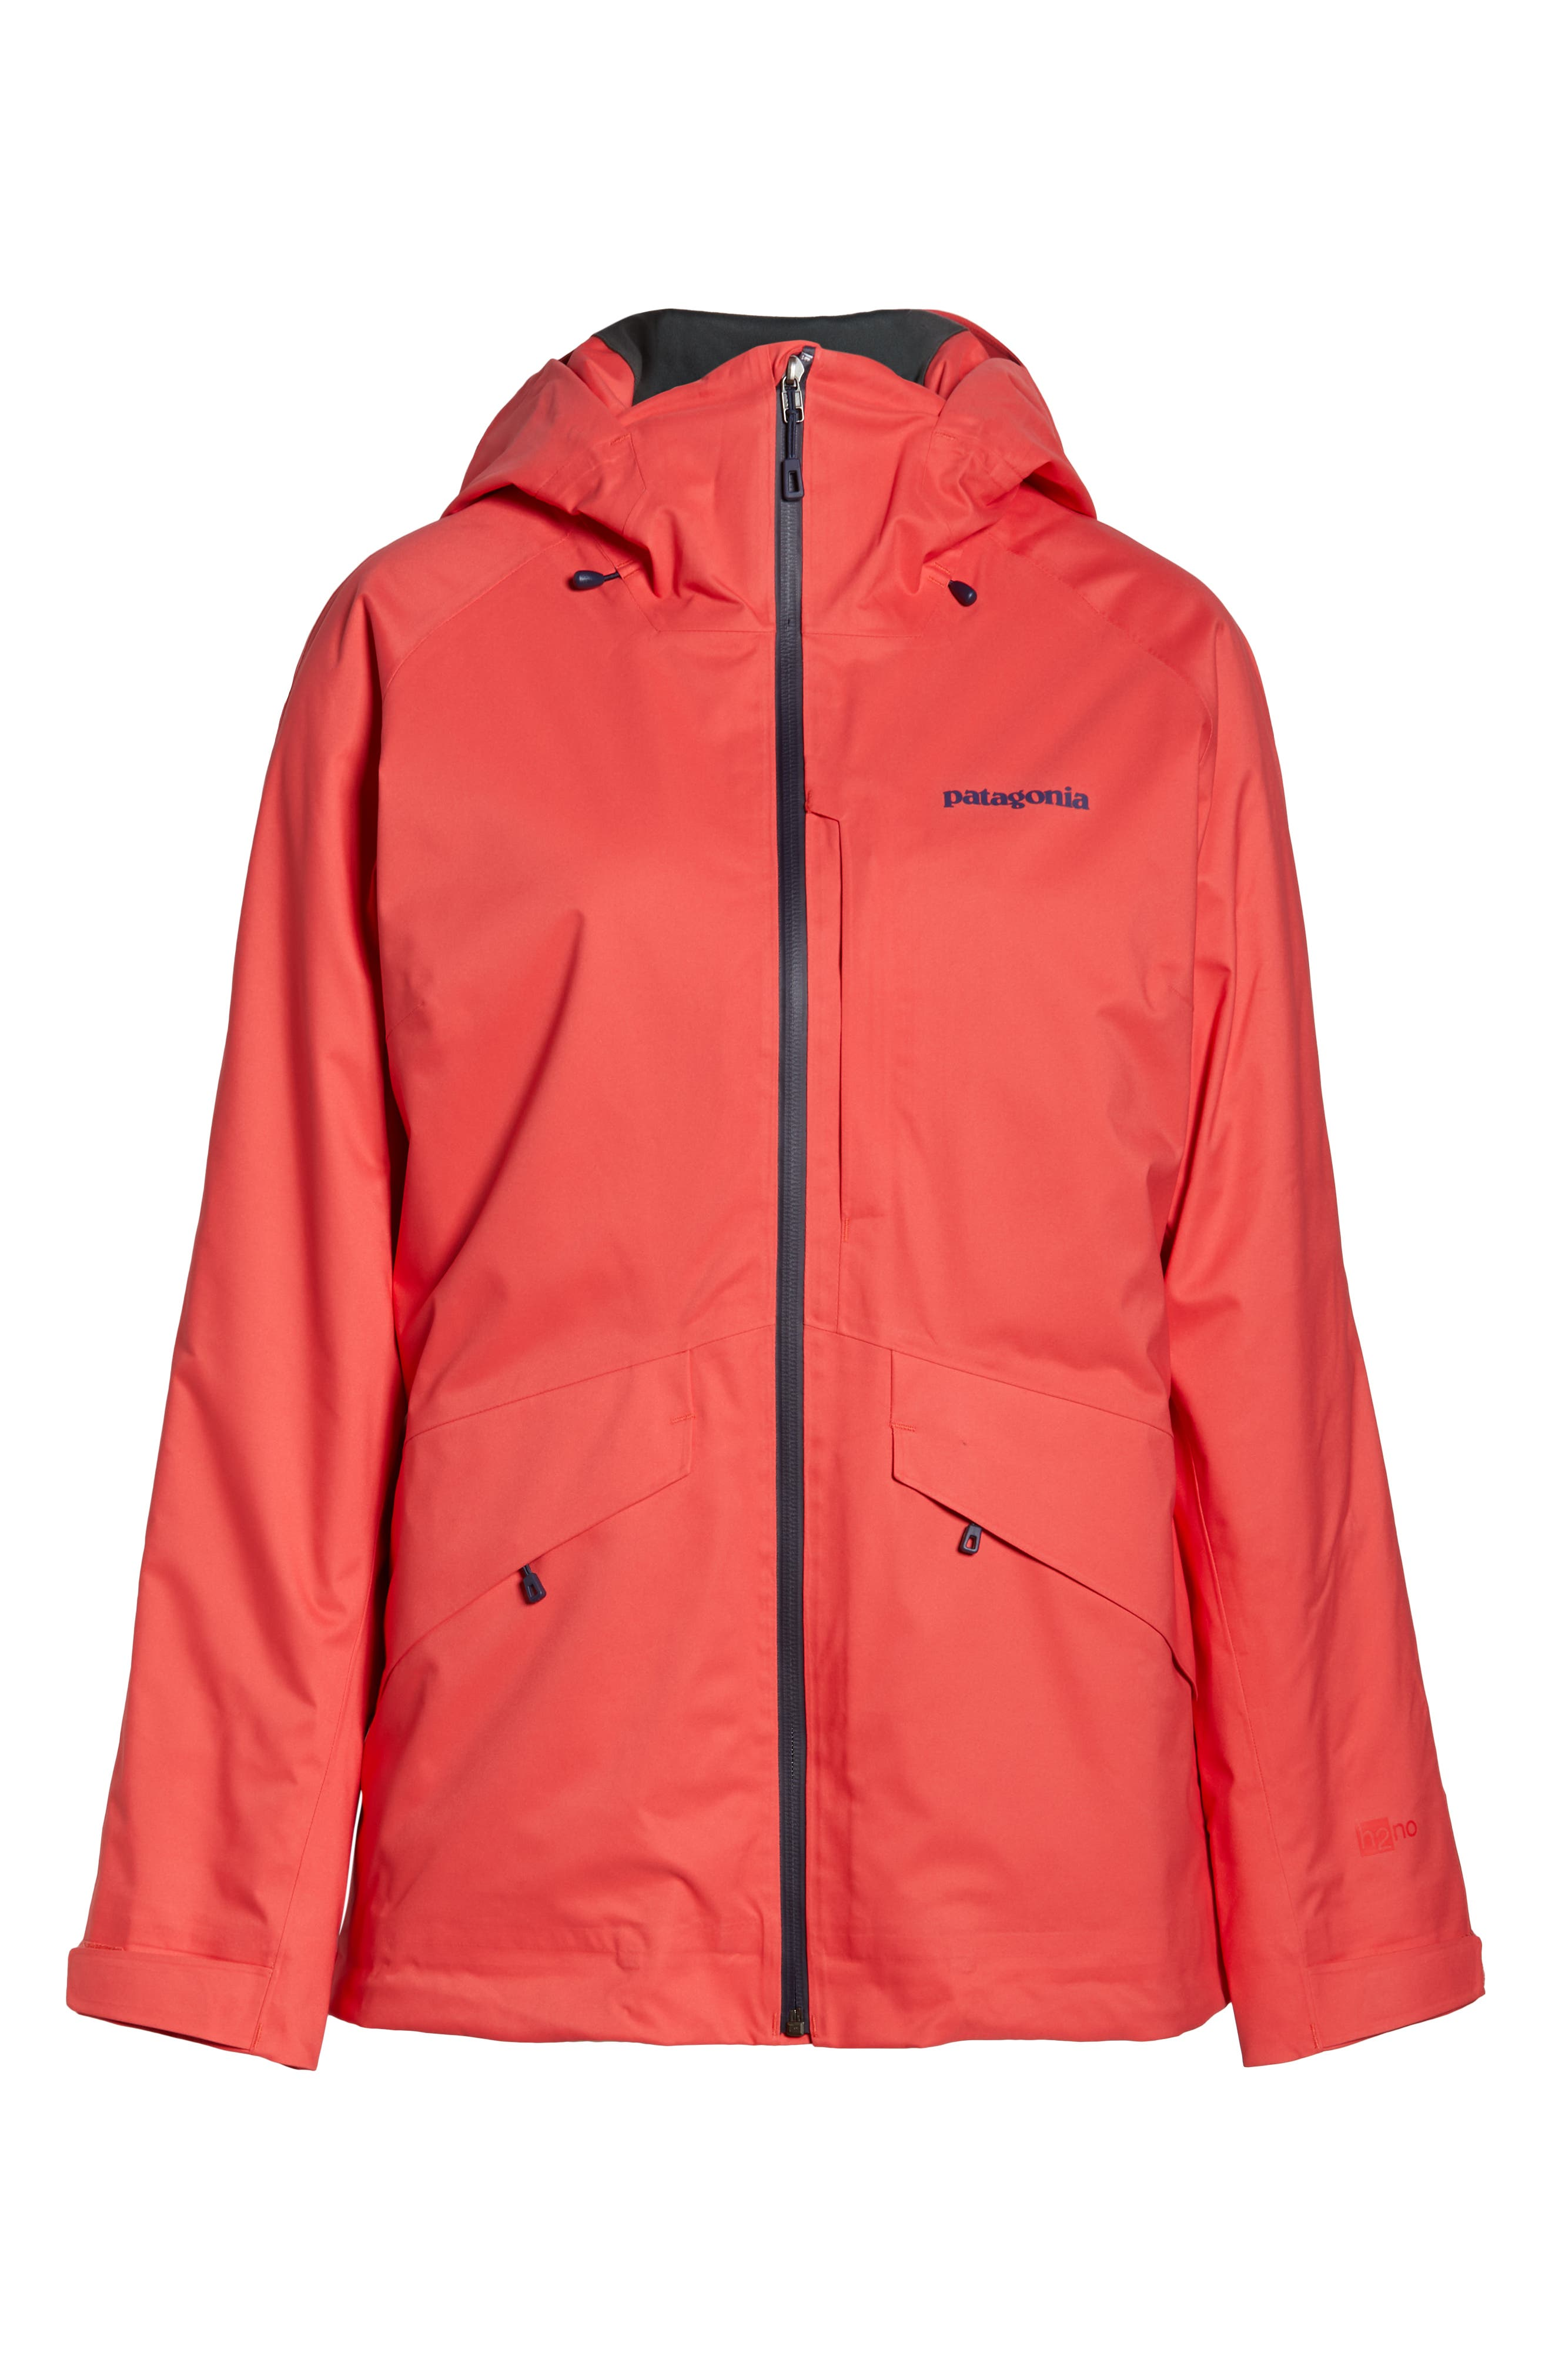 PATAGONIA,                             Snowbelle Insulated Ski Jacket,                             Alternate thumbnail 6, color,                             601